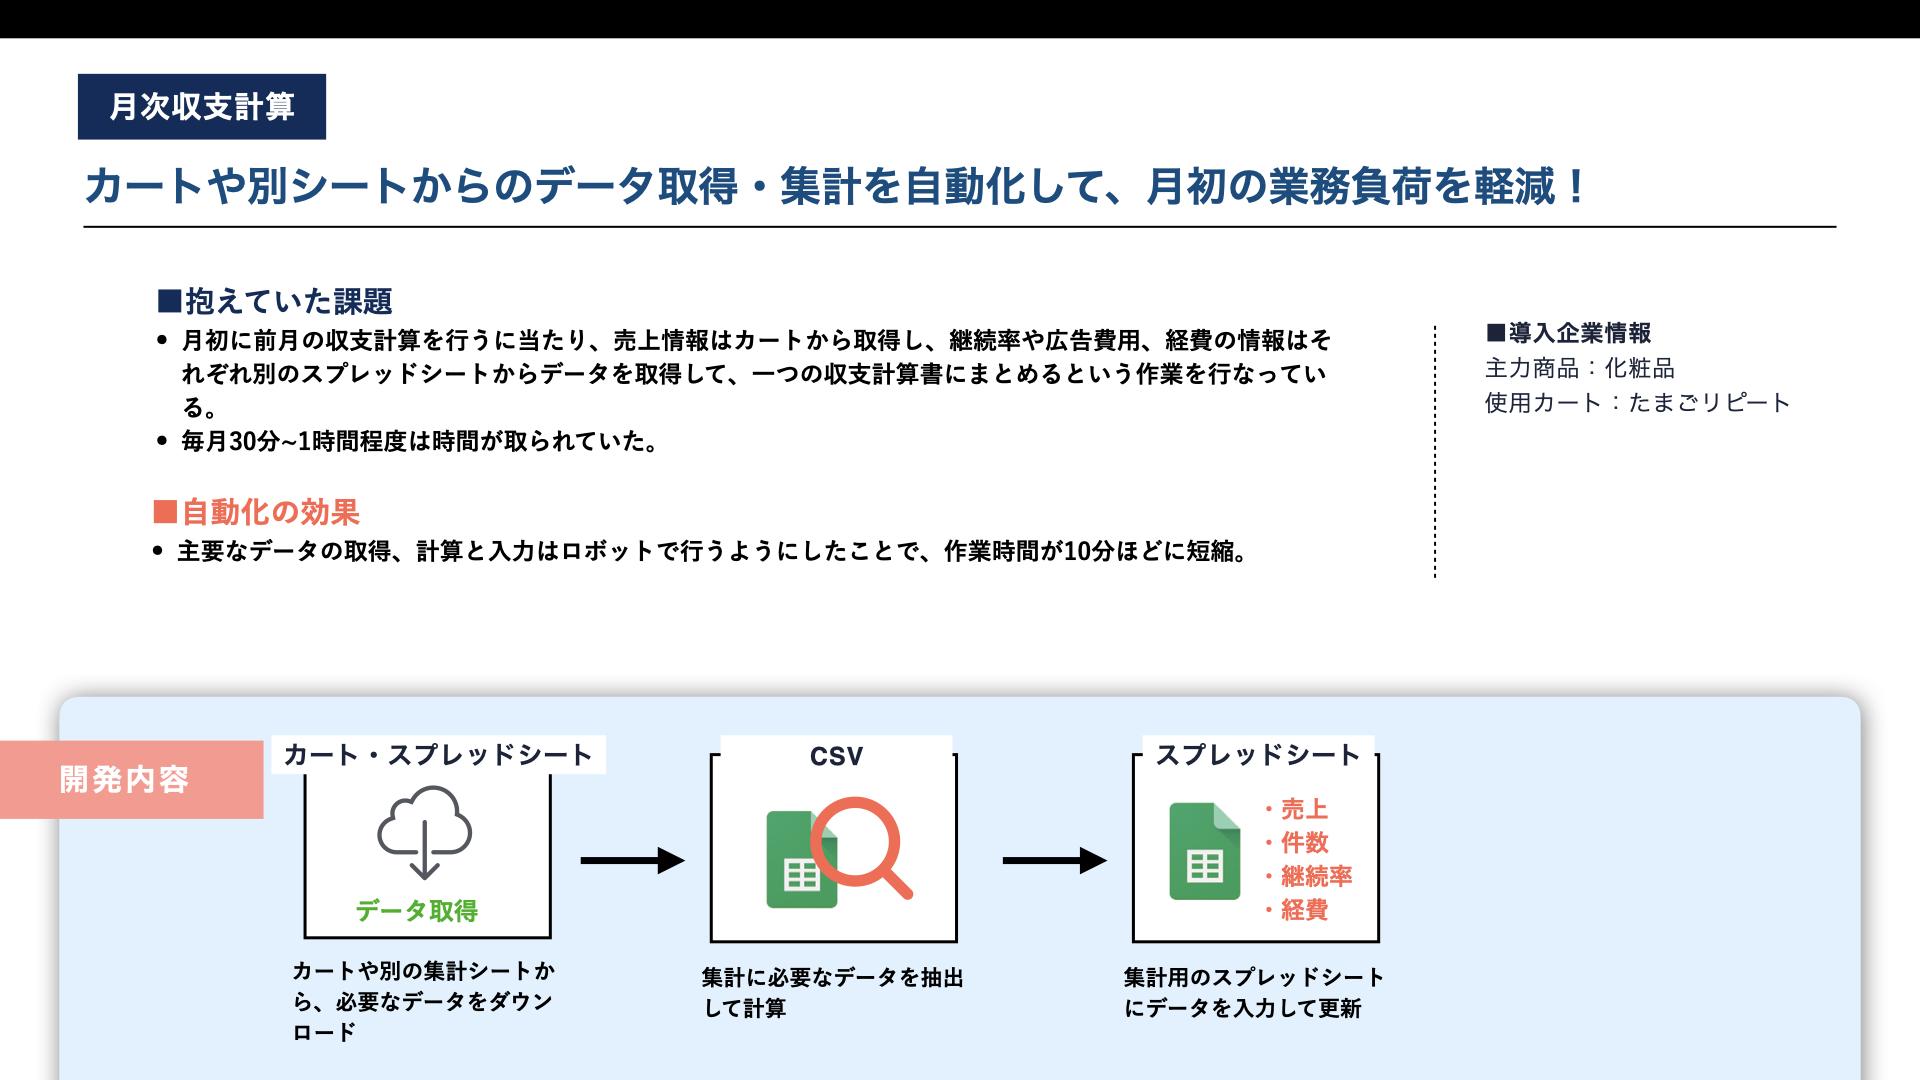 FULLTIME_サービス資料_v2JPEG.028